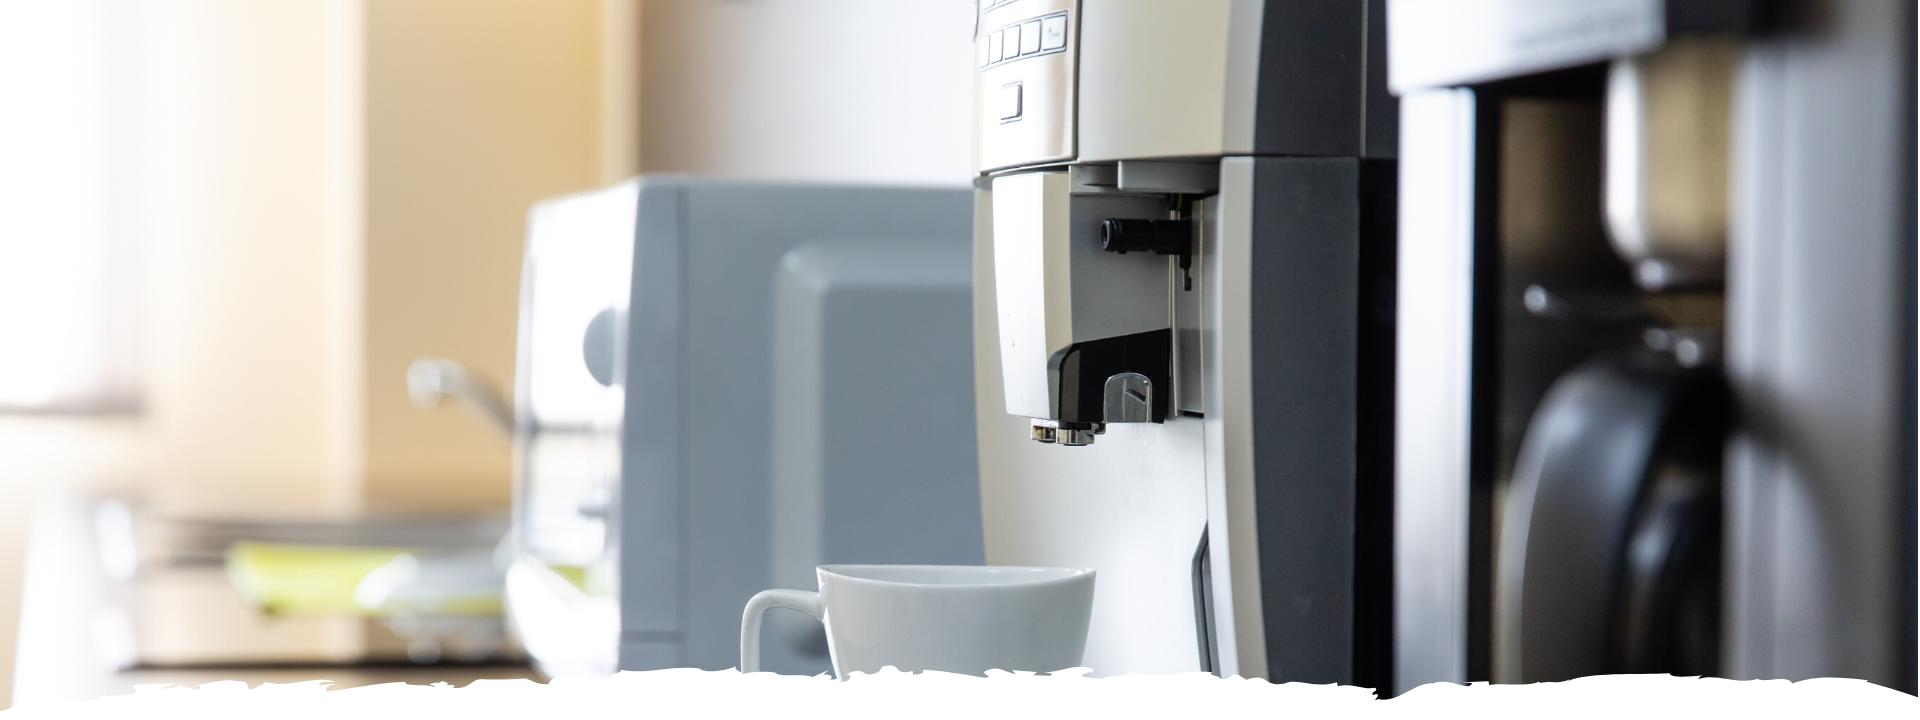 kaffeeleasing-com-trier3